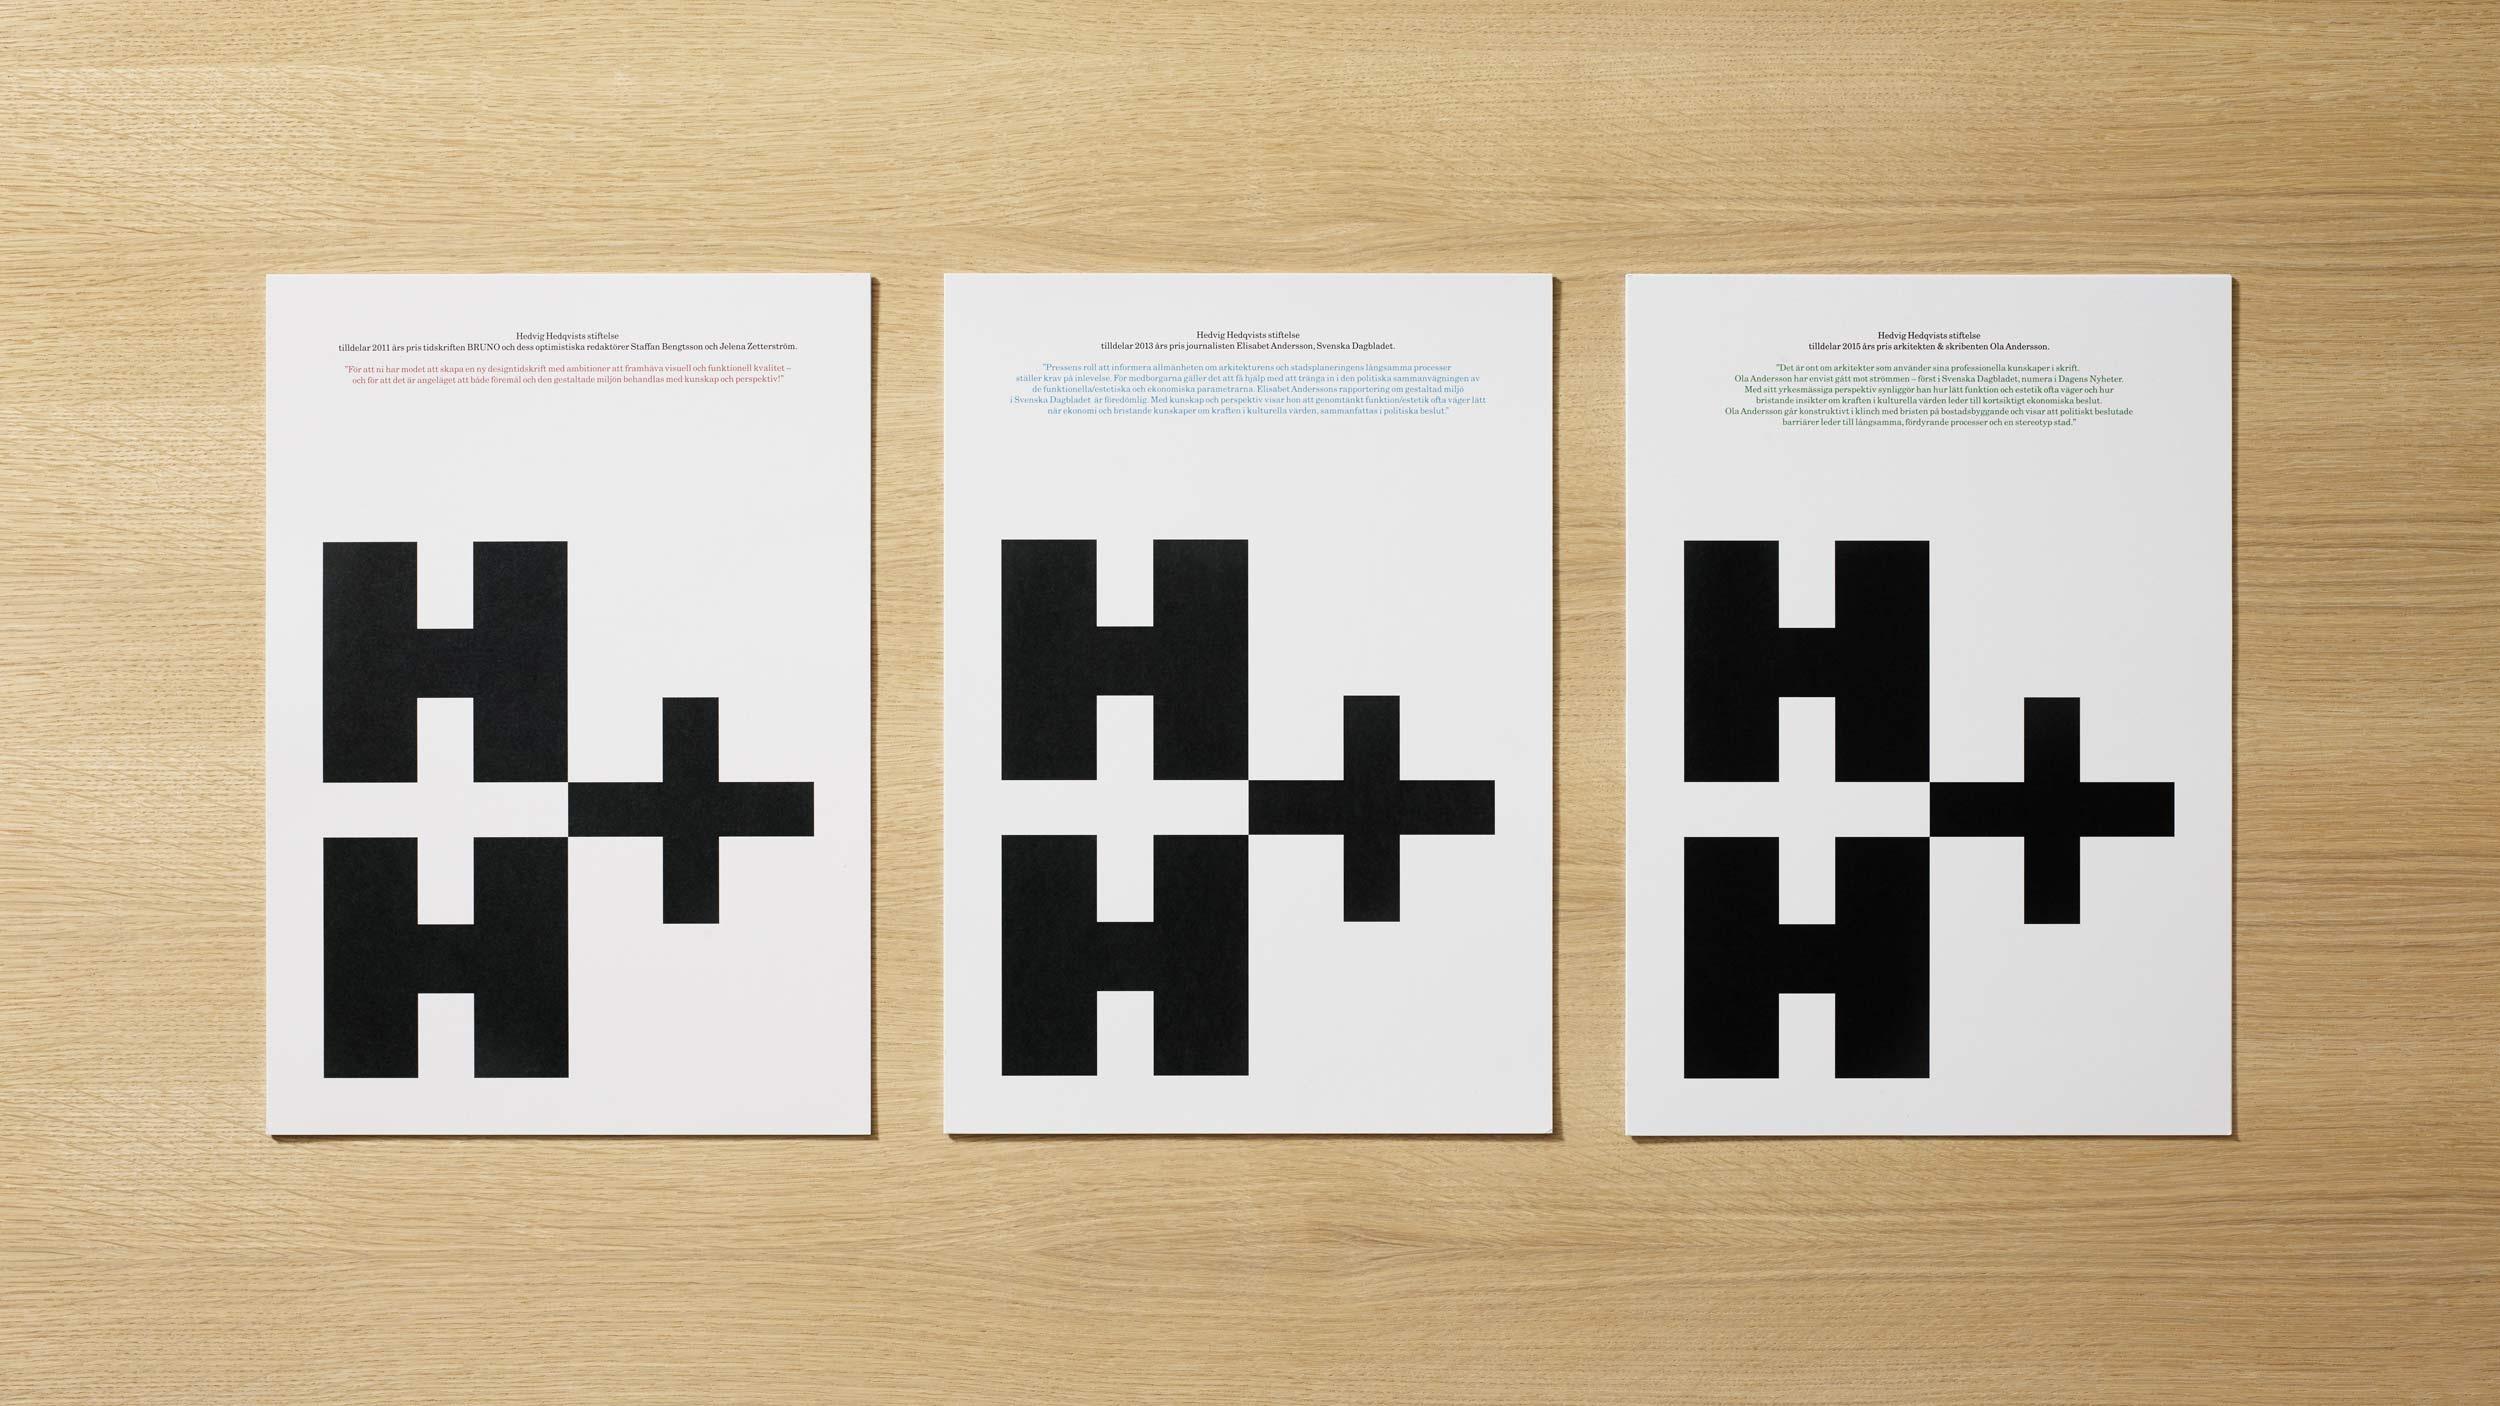 Hedvig Hedqvist Foundation – graphic identity